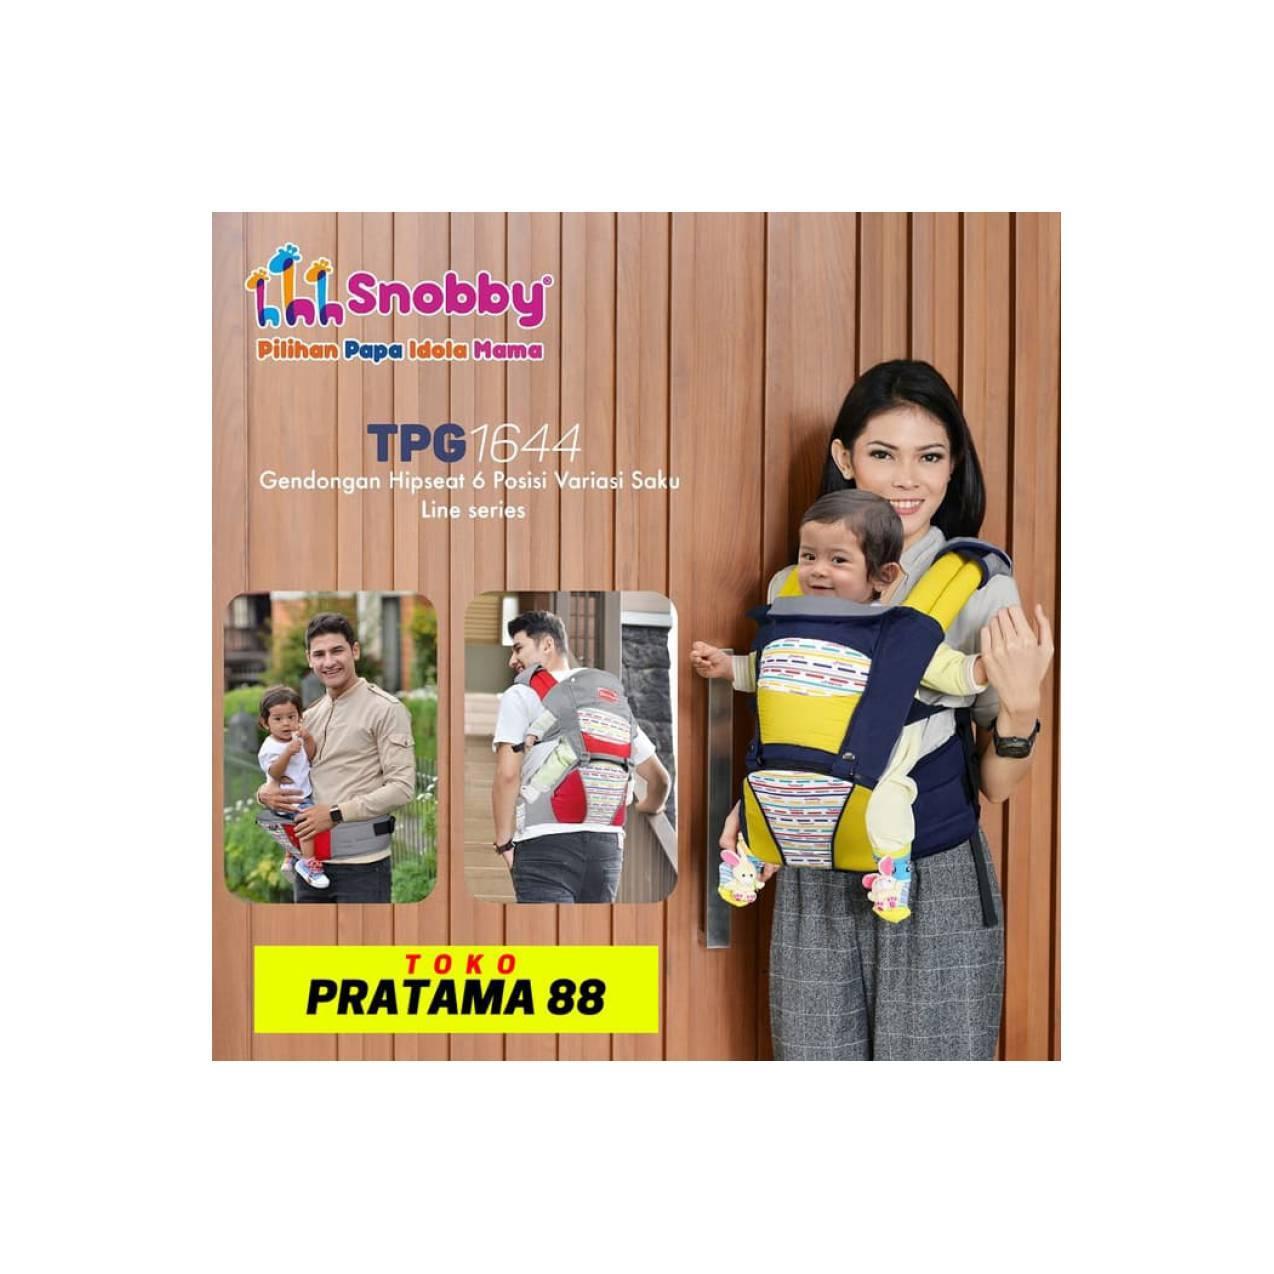 Baby Scots Baju Bayi Ad 092 Pink 3 6 Bulan Daftar Harga Terkini Source · 4